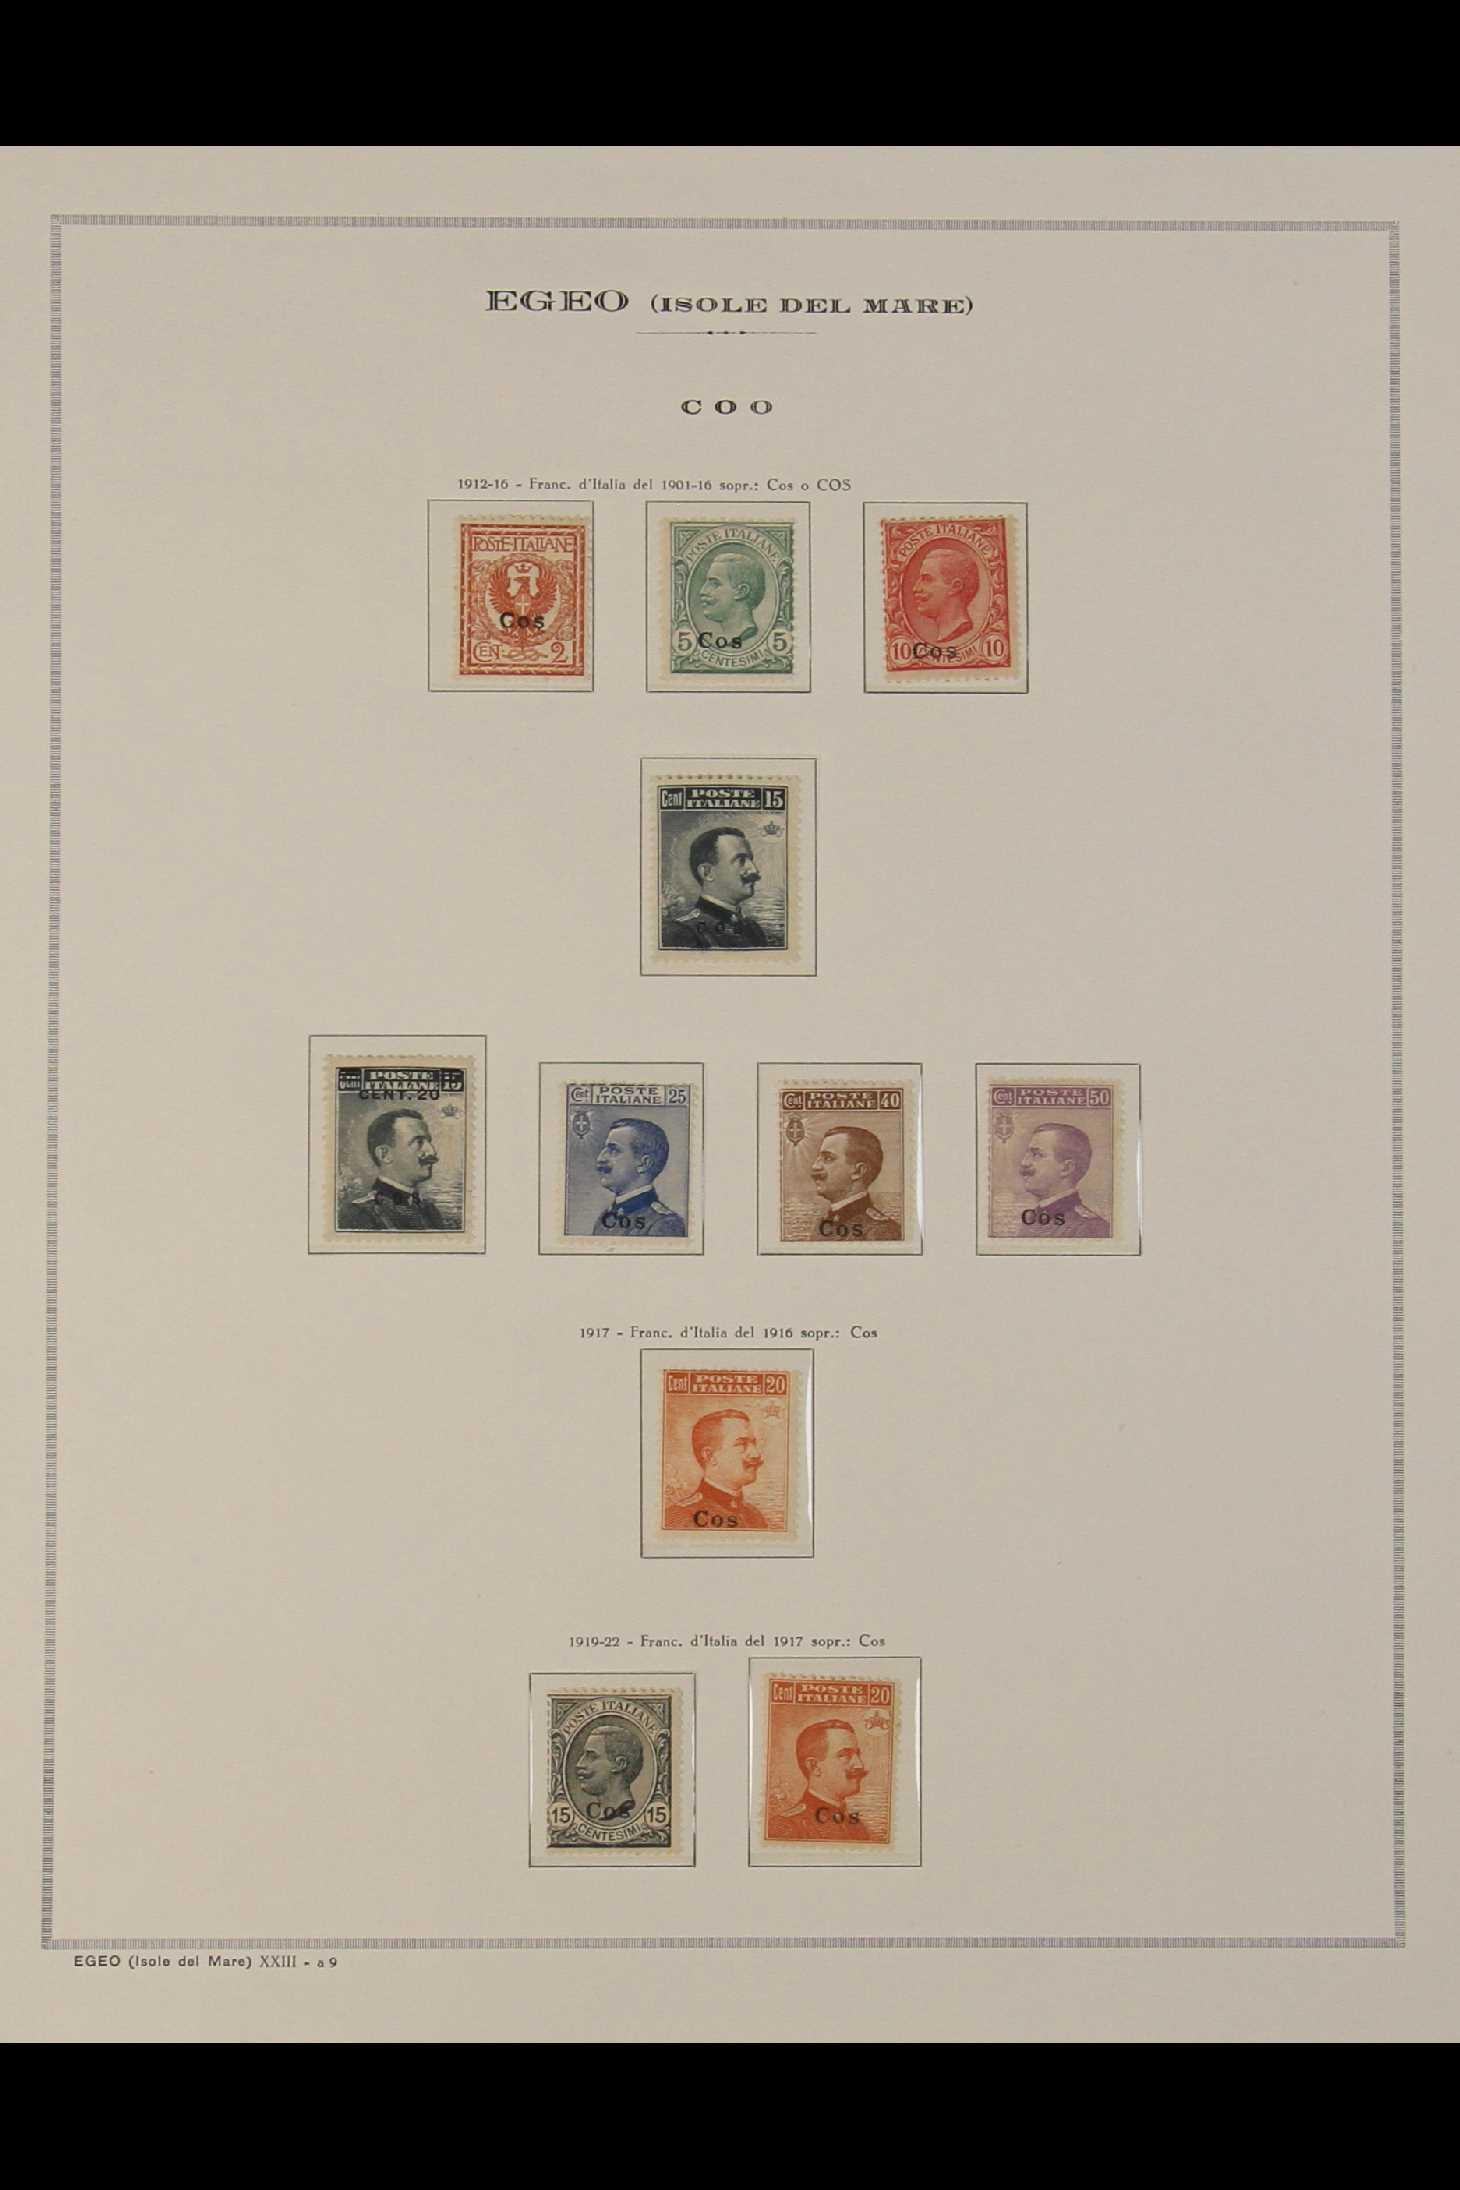 ITALIAN COLONIES EGEO (DODECANESE ISLANDS COS (COO) 1912-1922 complete (Sassone 1/11, SG 3C/13C),